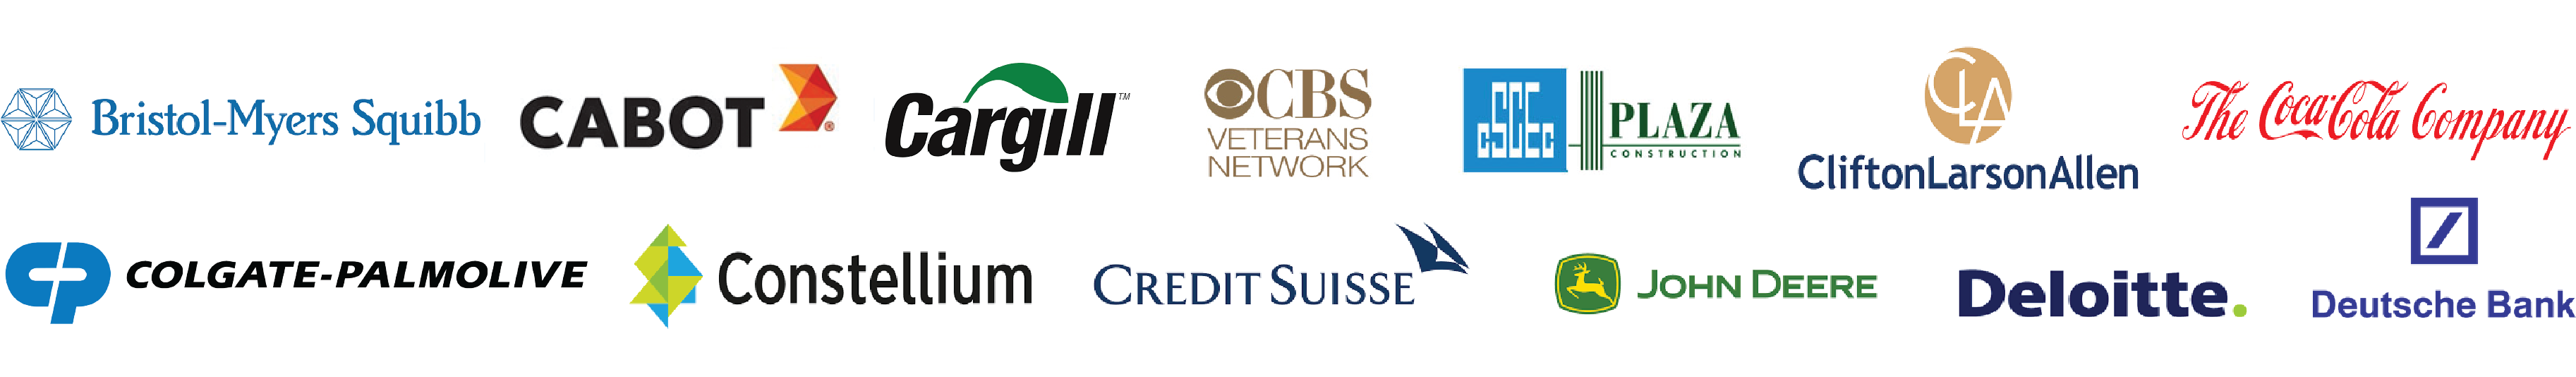 Program Overview American Corporate Partners